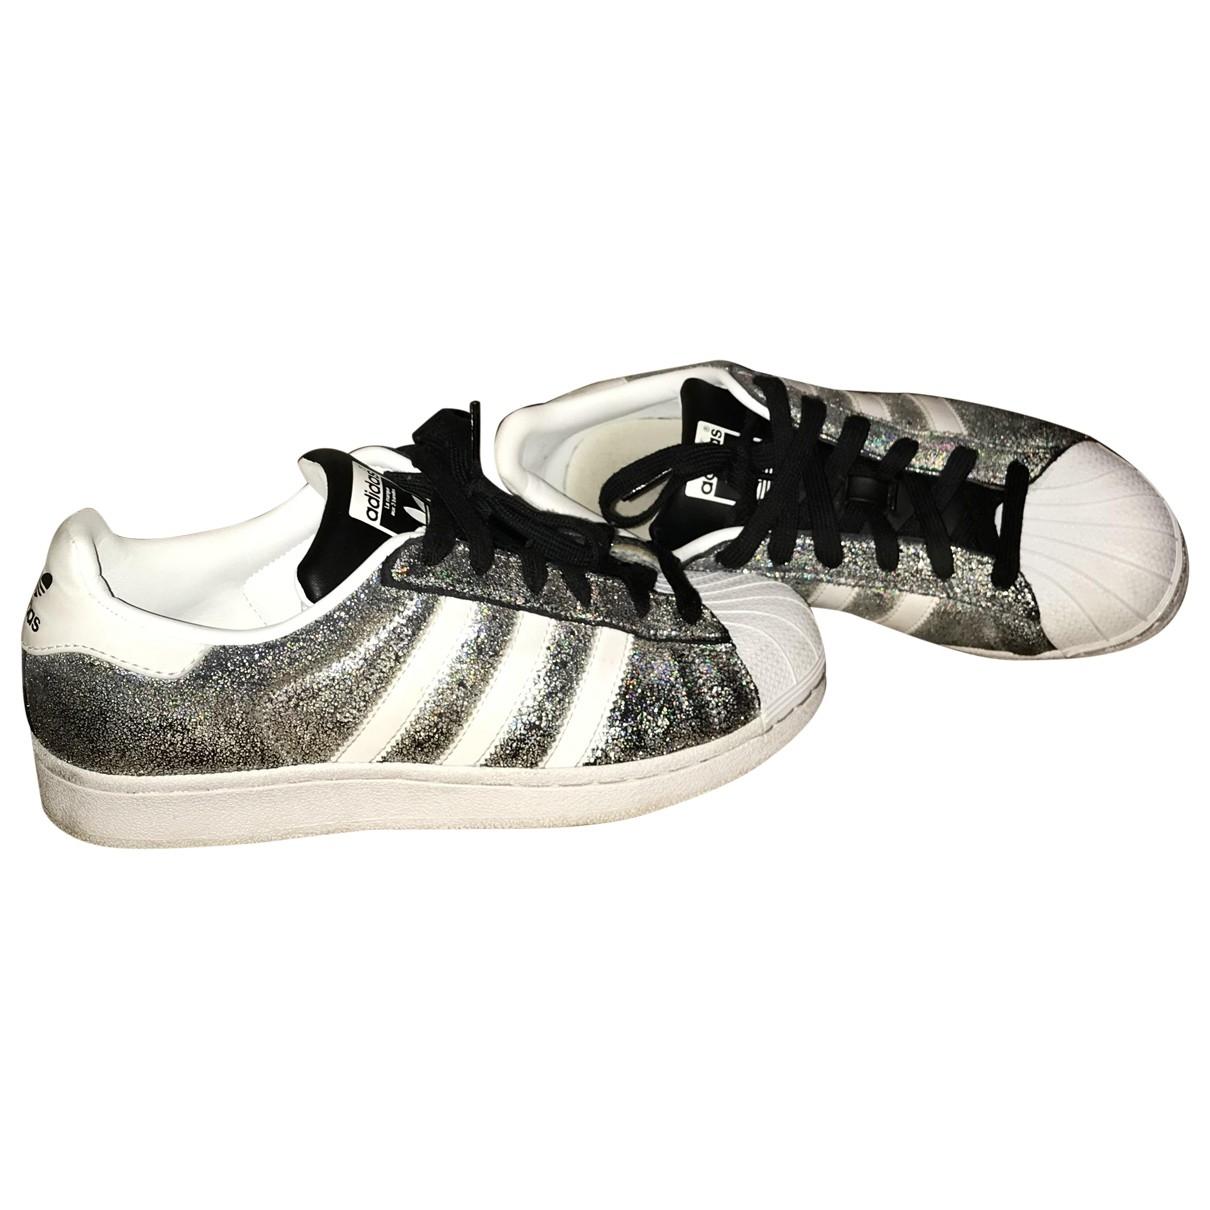 Adidas Superstar Metallic Trainers for Women 39.5 EU